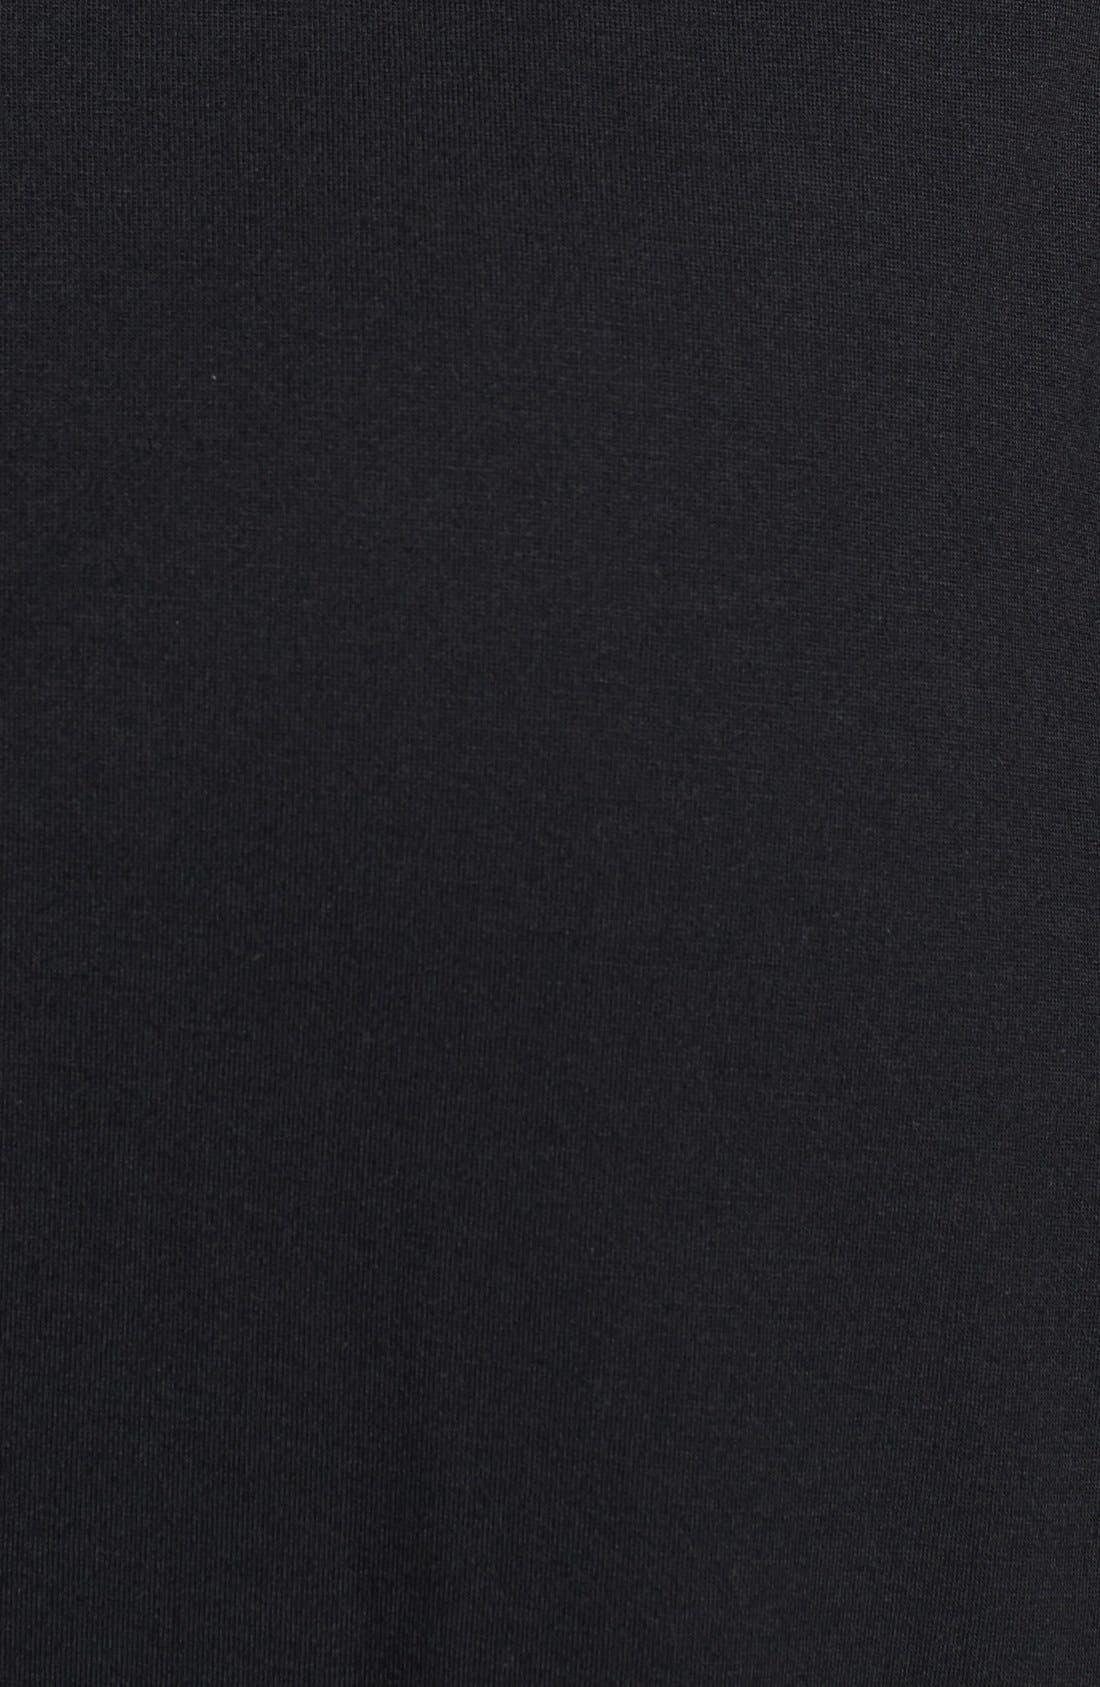 'Shangri La' Nightgown,                             Alternate thumbnail 2, color,                             BLACK